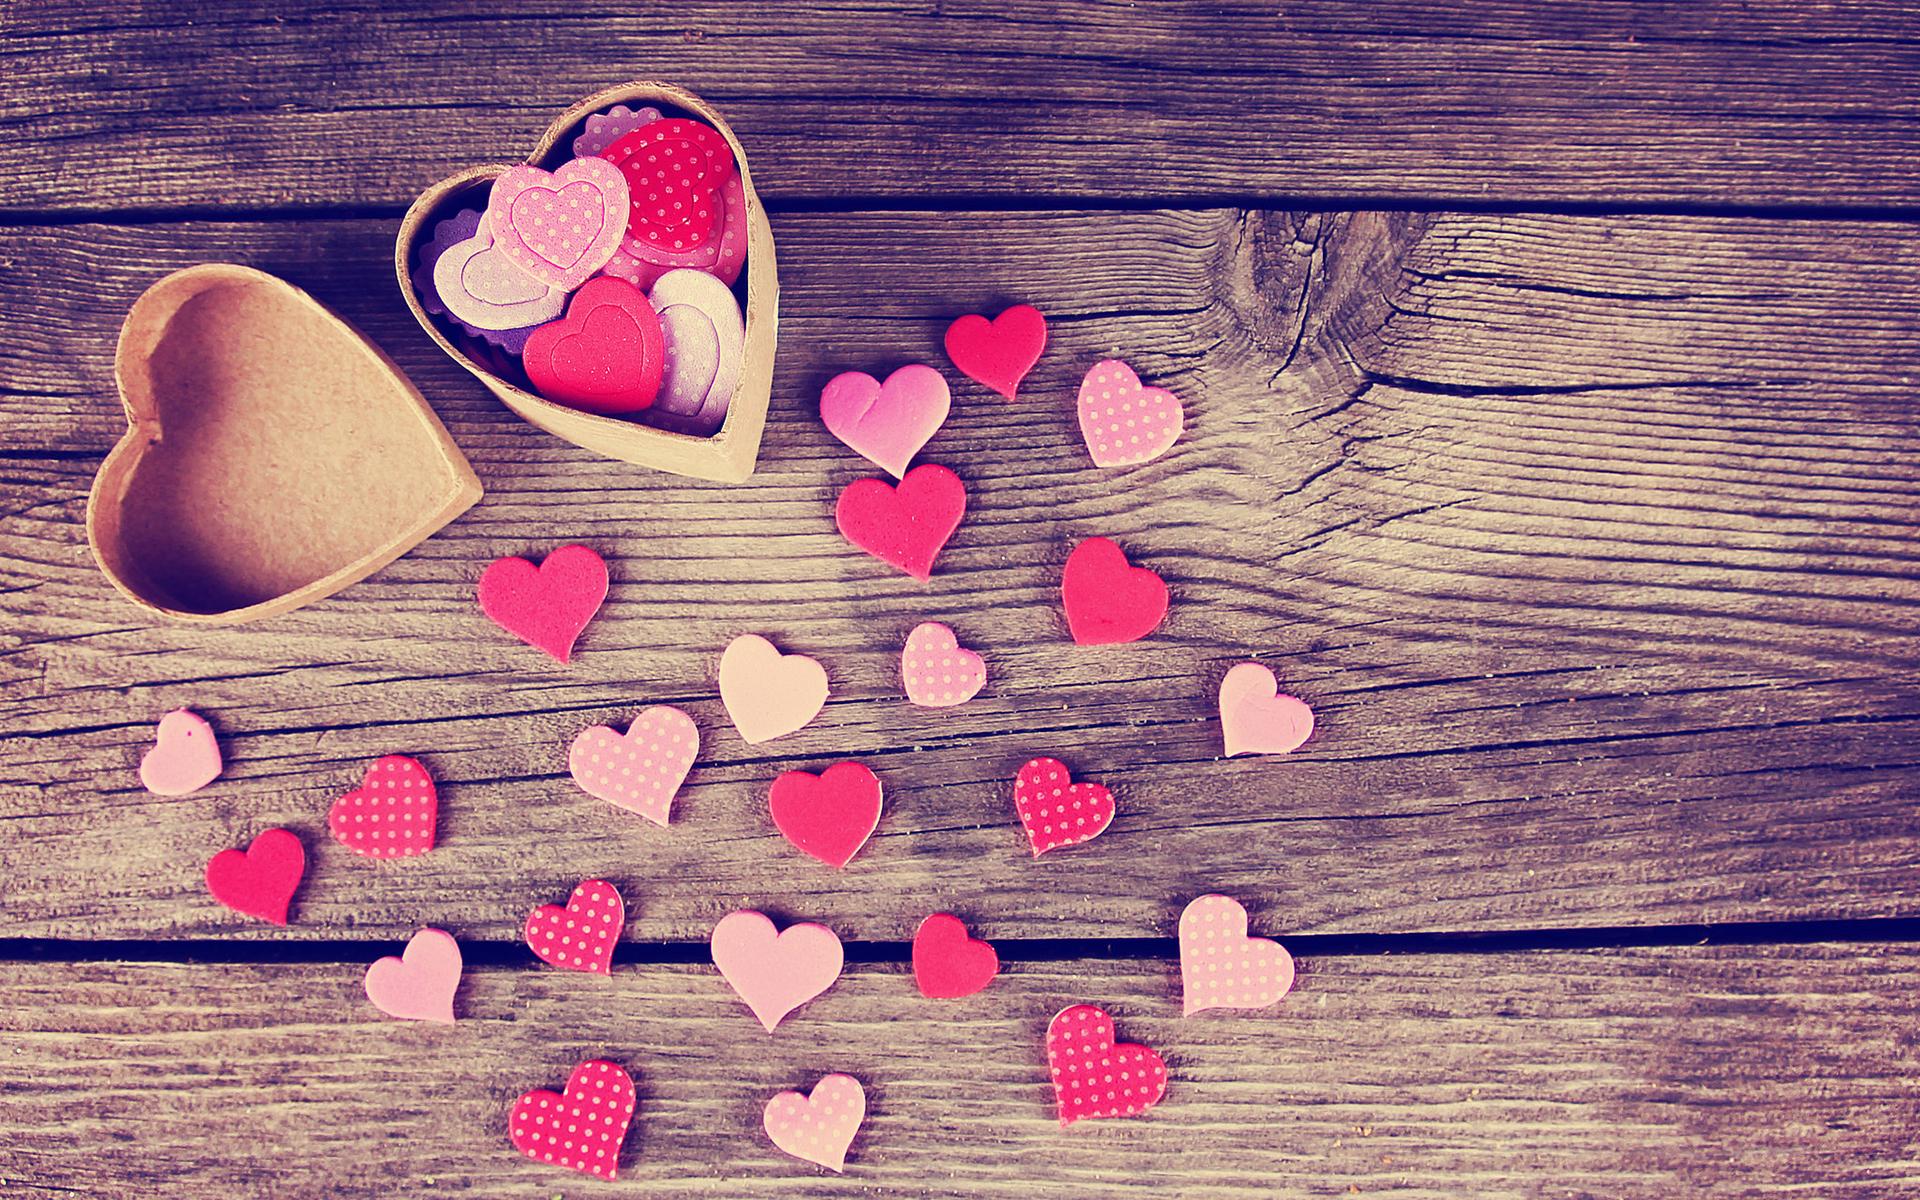 Обои сердце, шов, разбитое сердце, рисунок. Разное foto 10